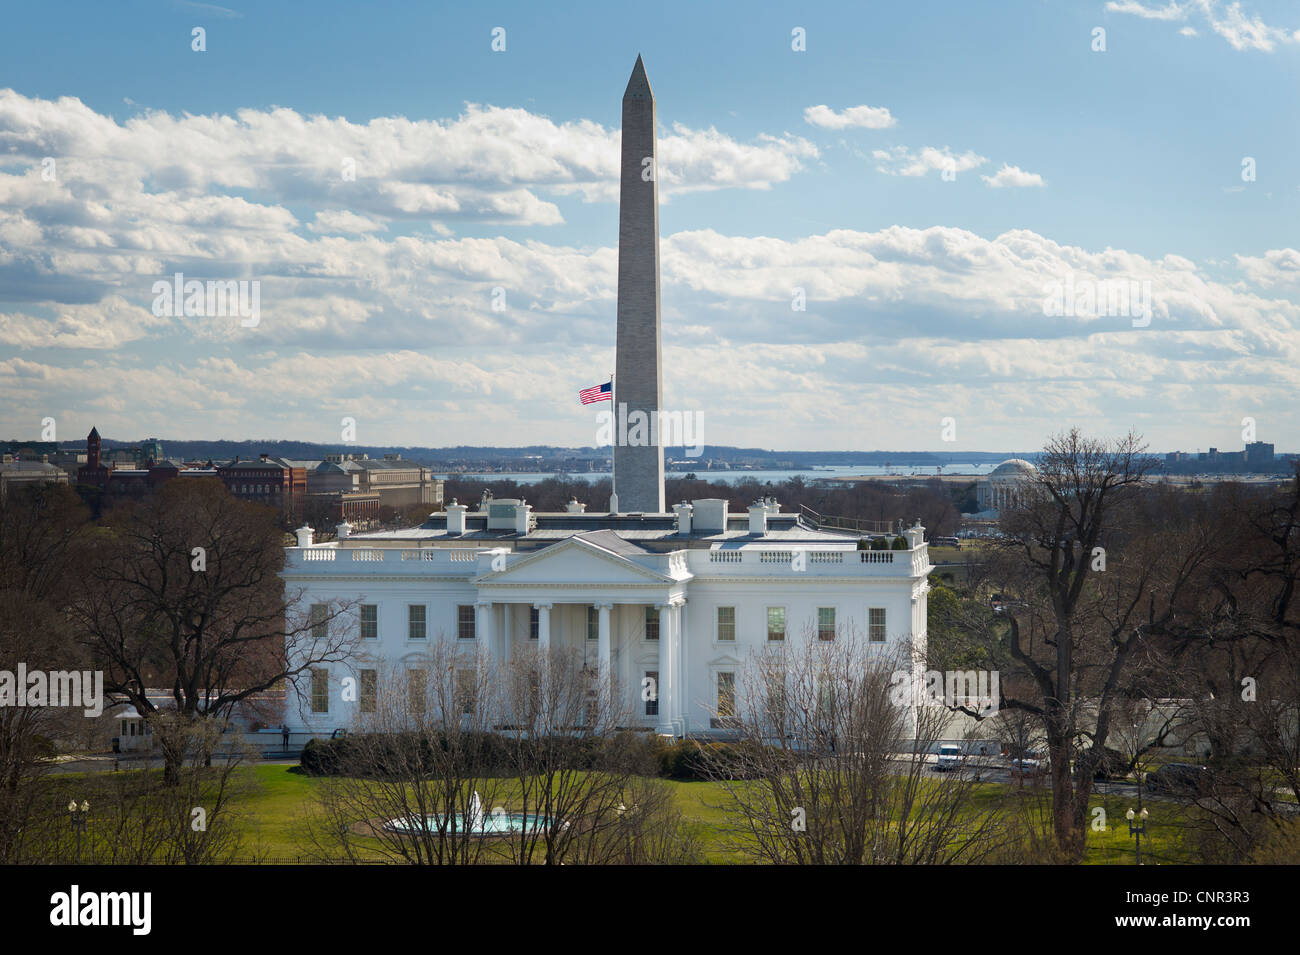 THE WHITE HOUSE WASHINGTON DC - Stock Image